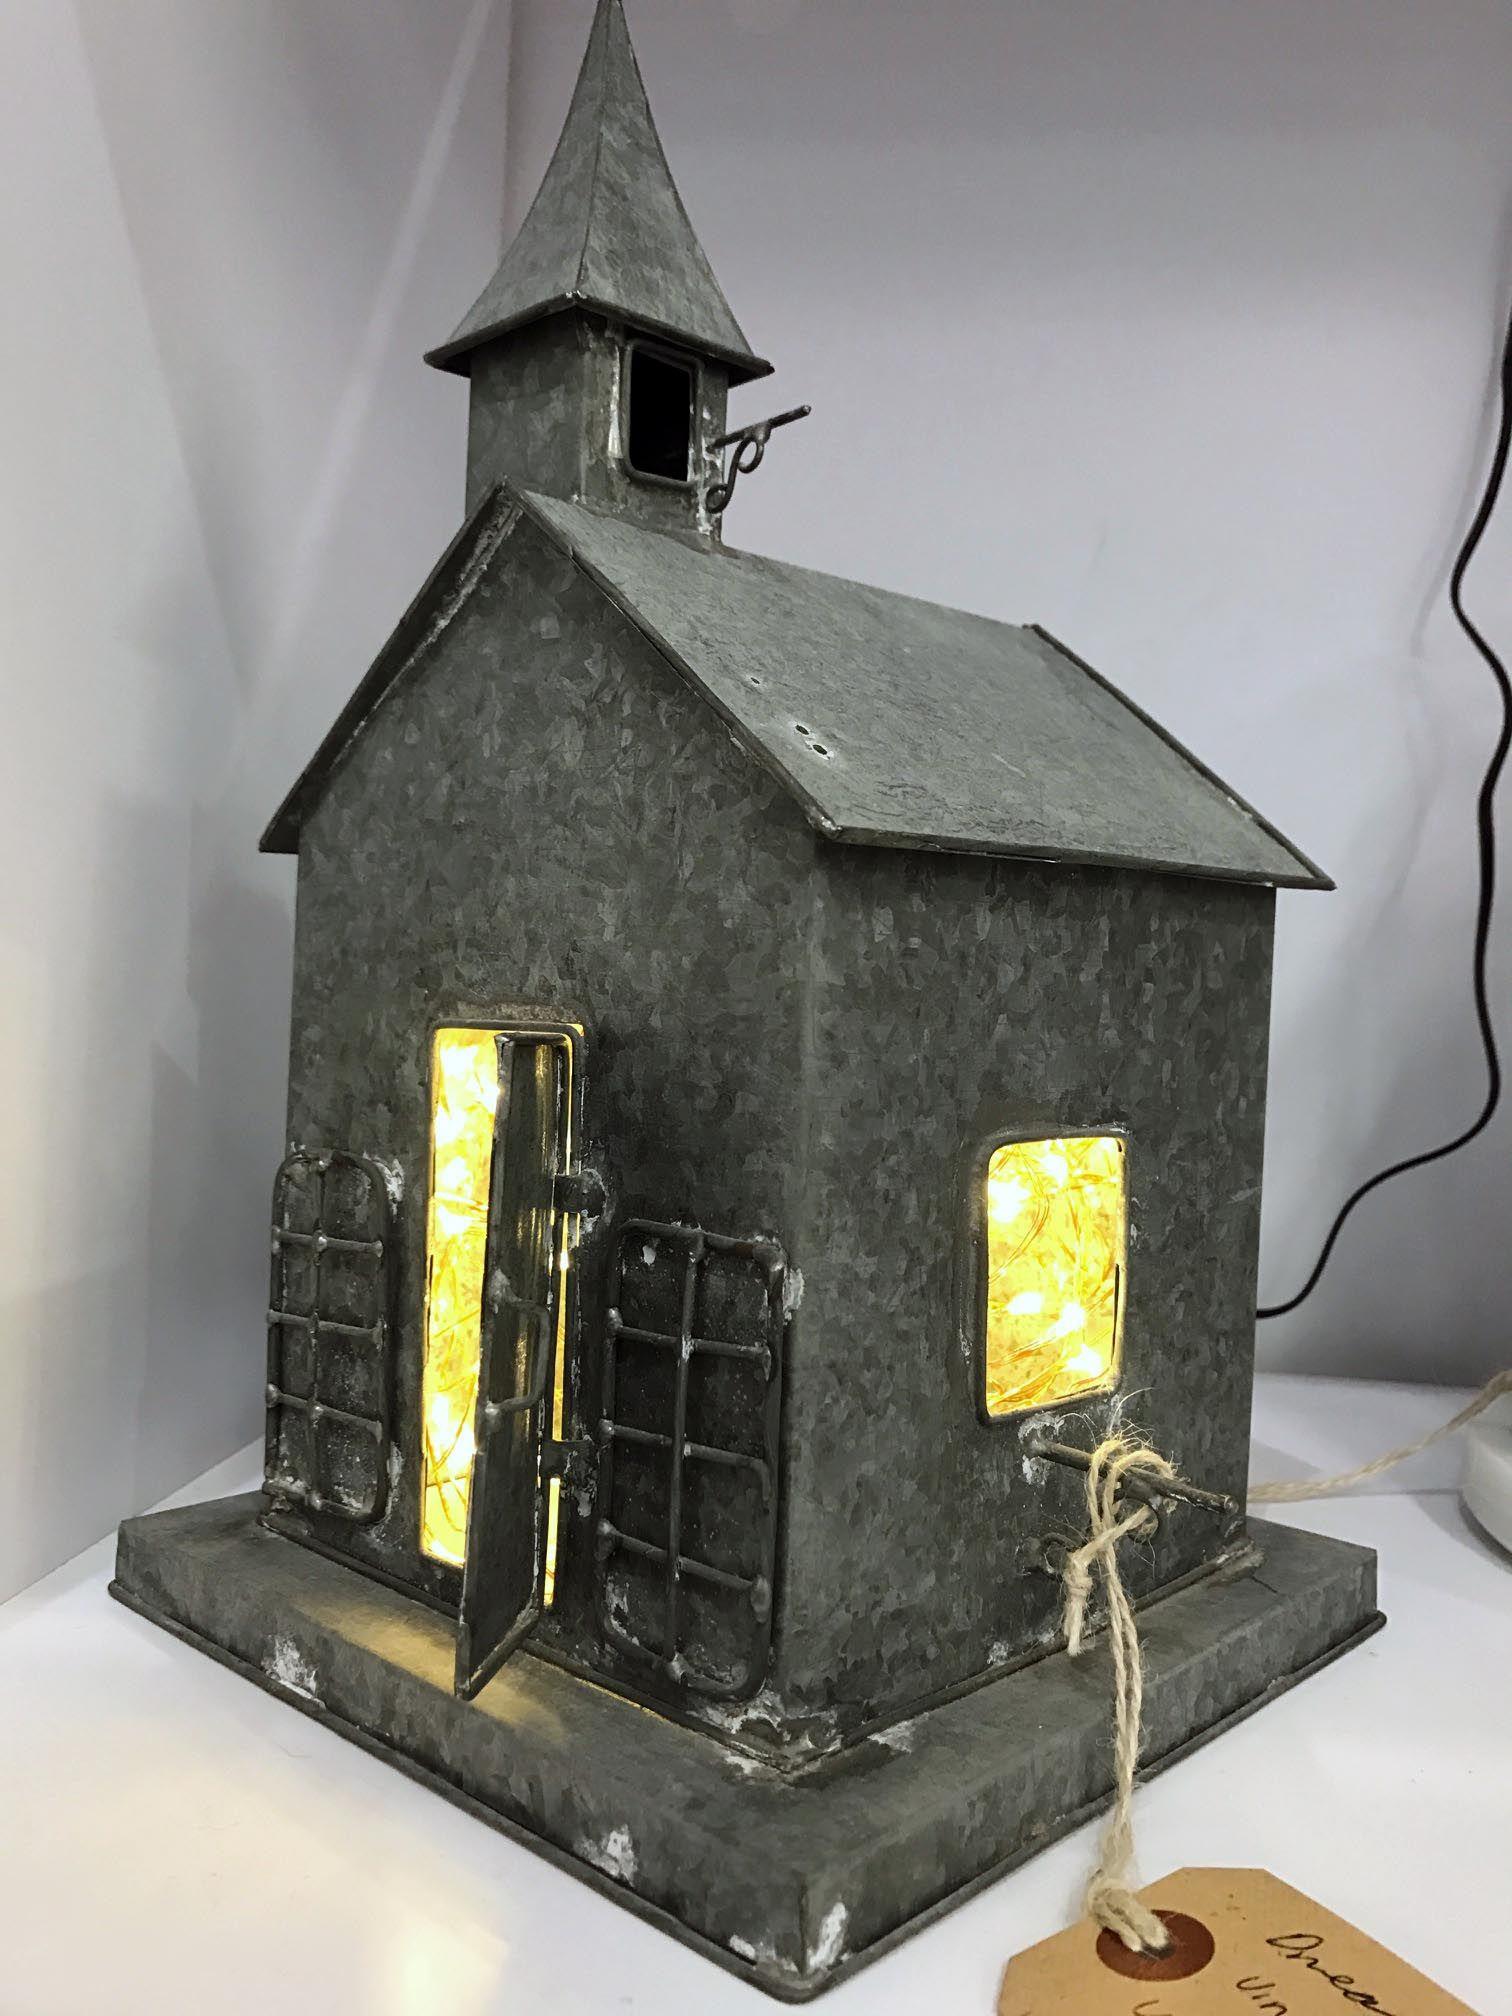 Vintage Perth Dream Galaxy vintage dutch house $180